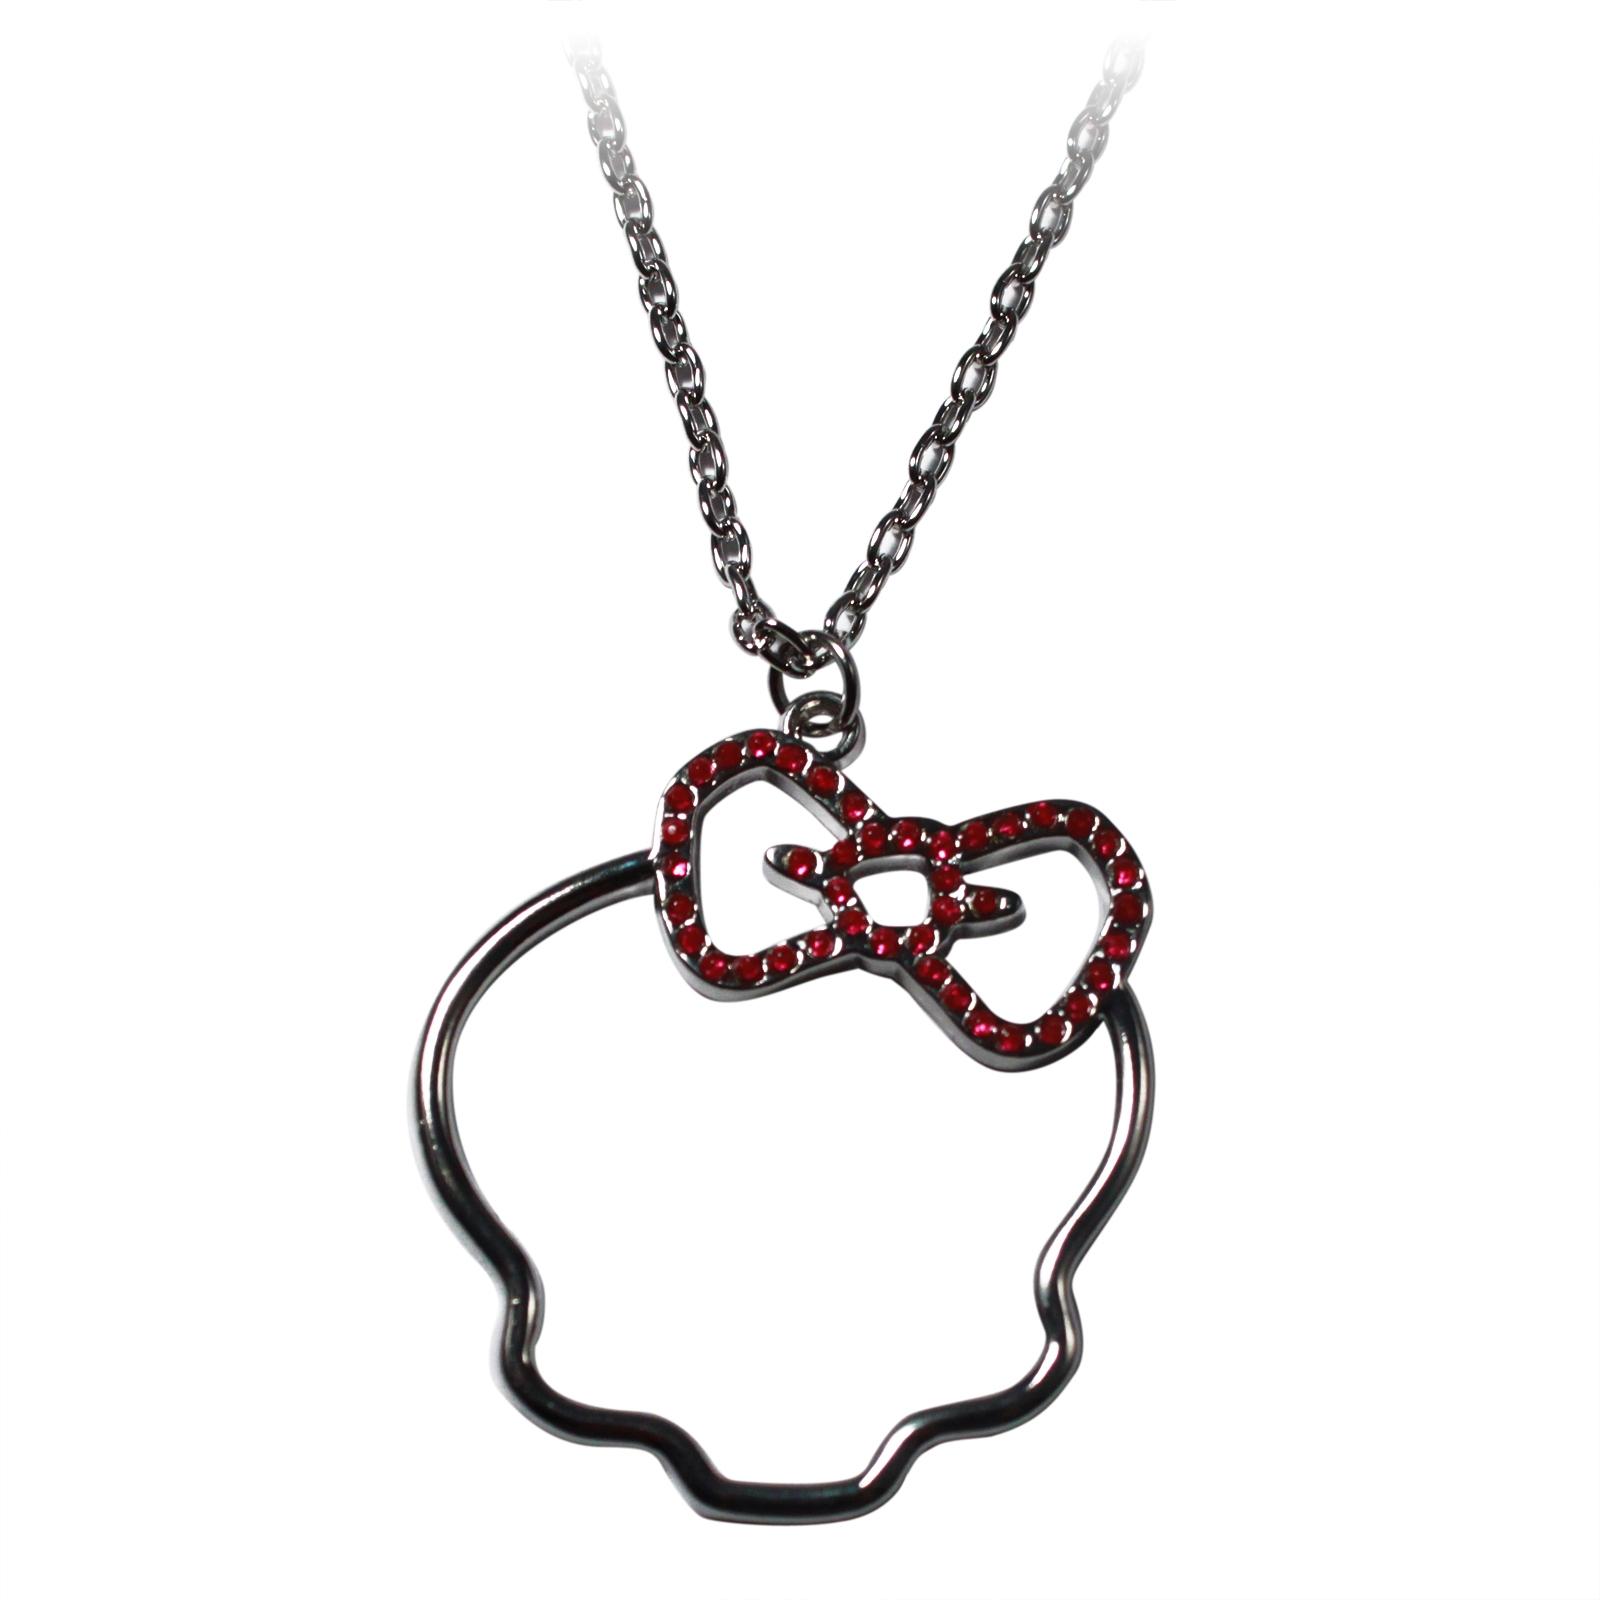 Mattel Monster High Necklace